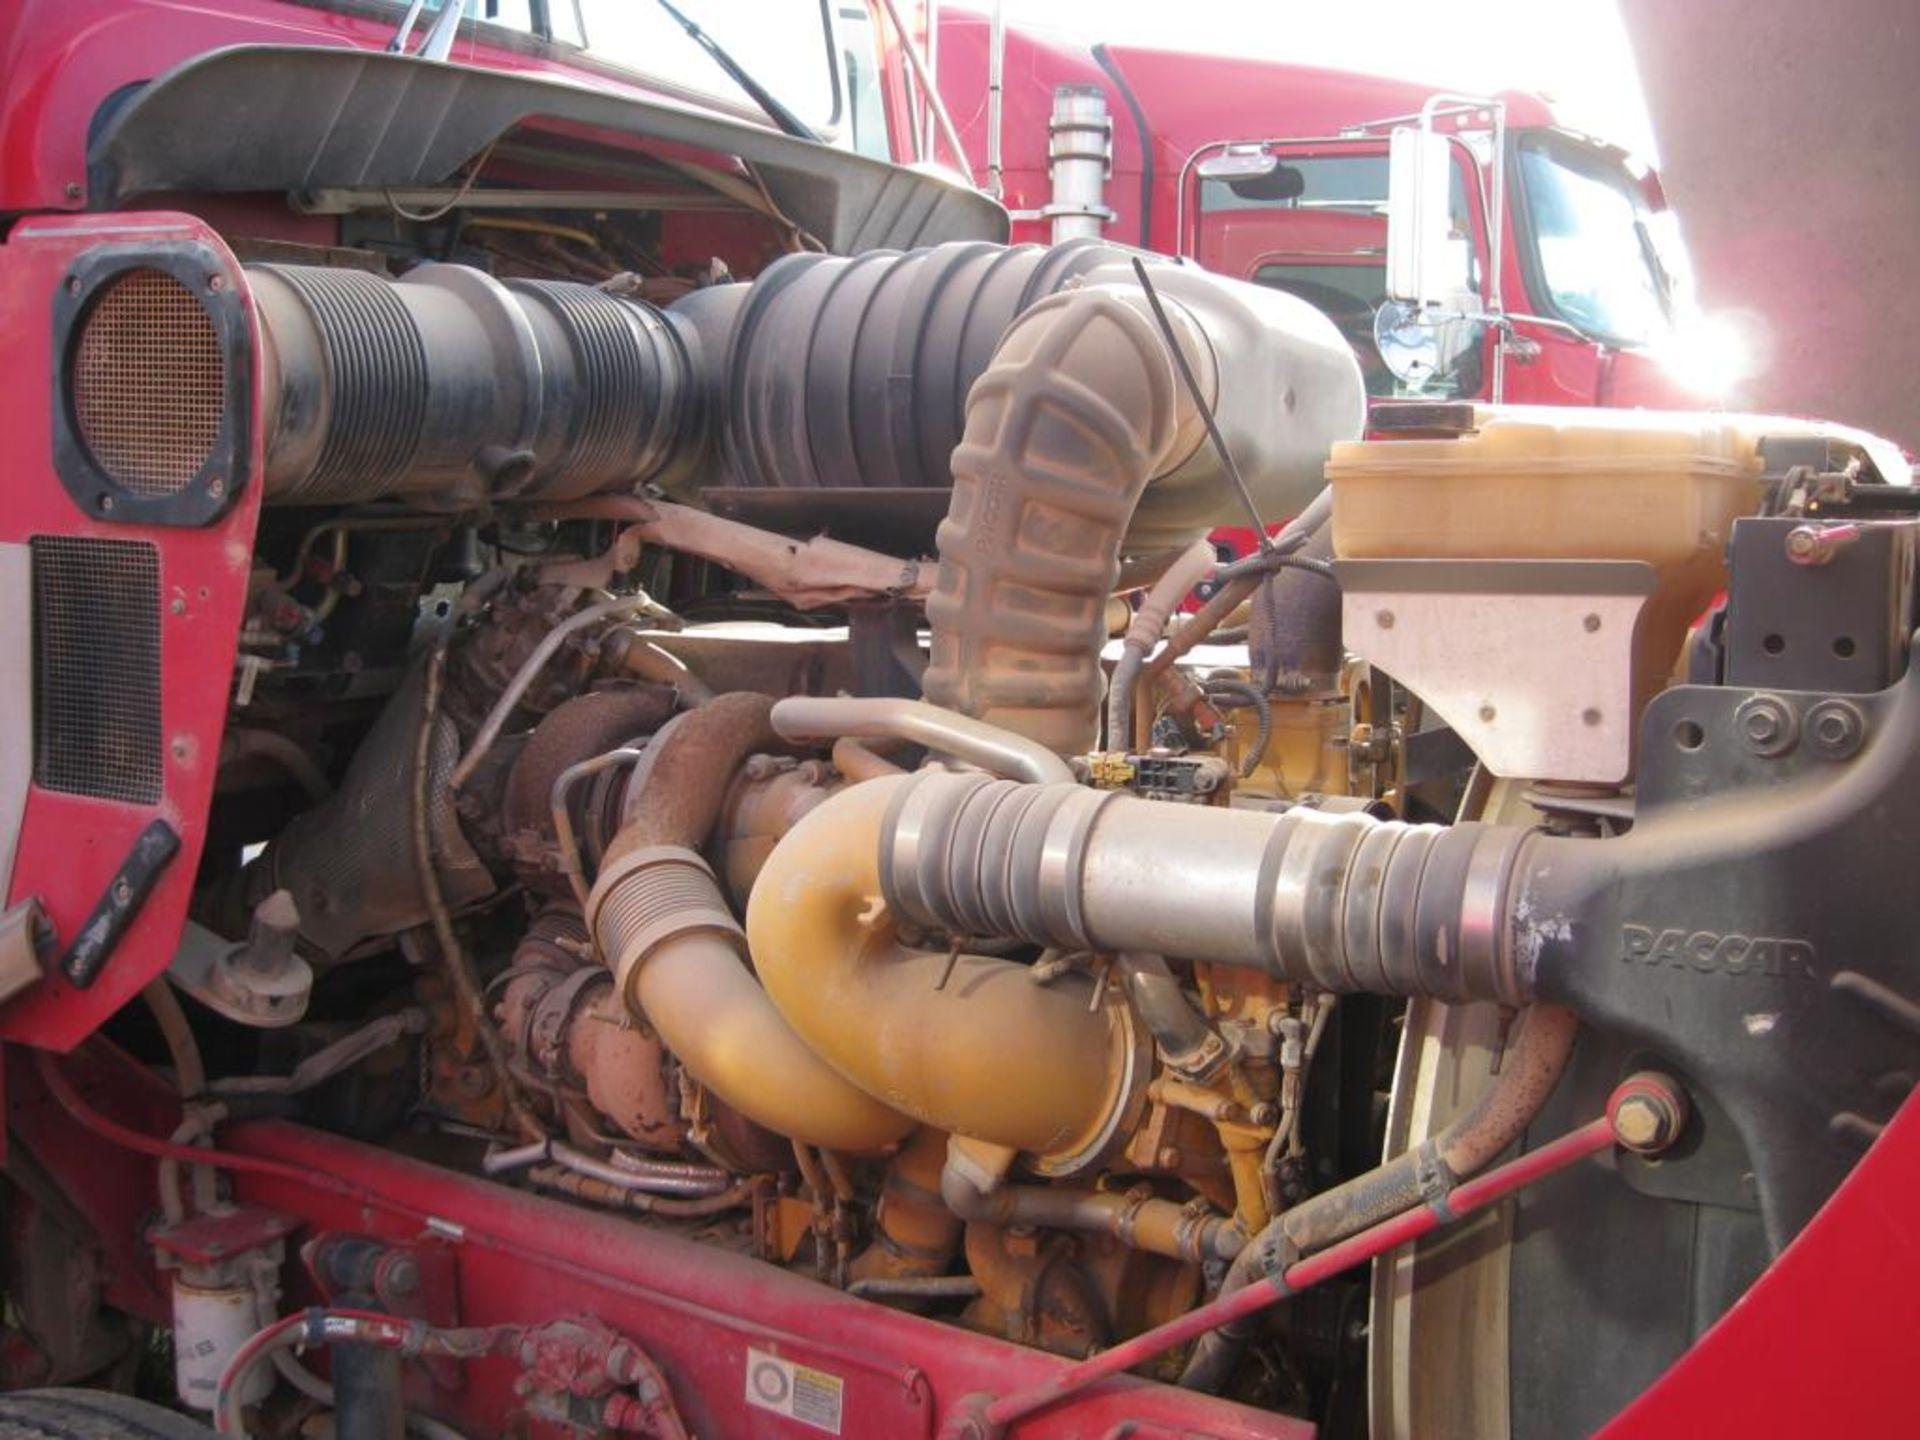 Kenworth Winch Truck - Image 22 of 22